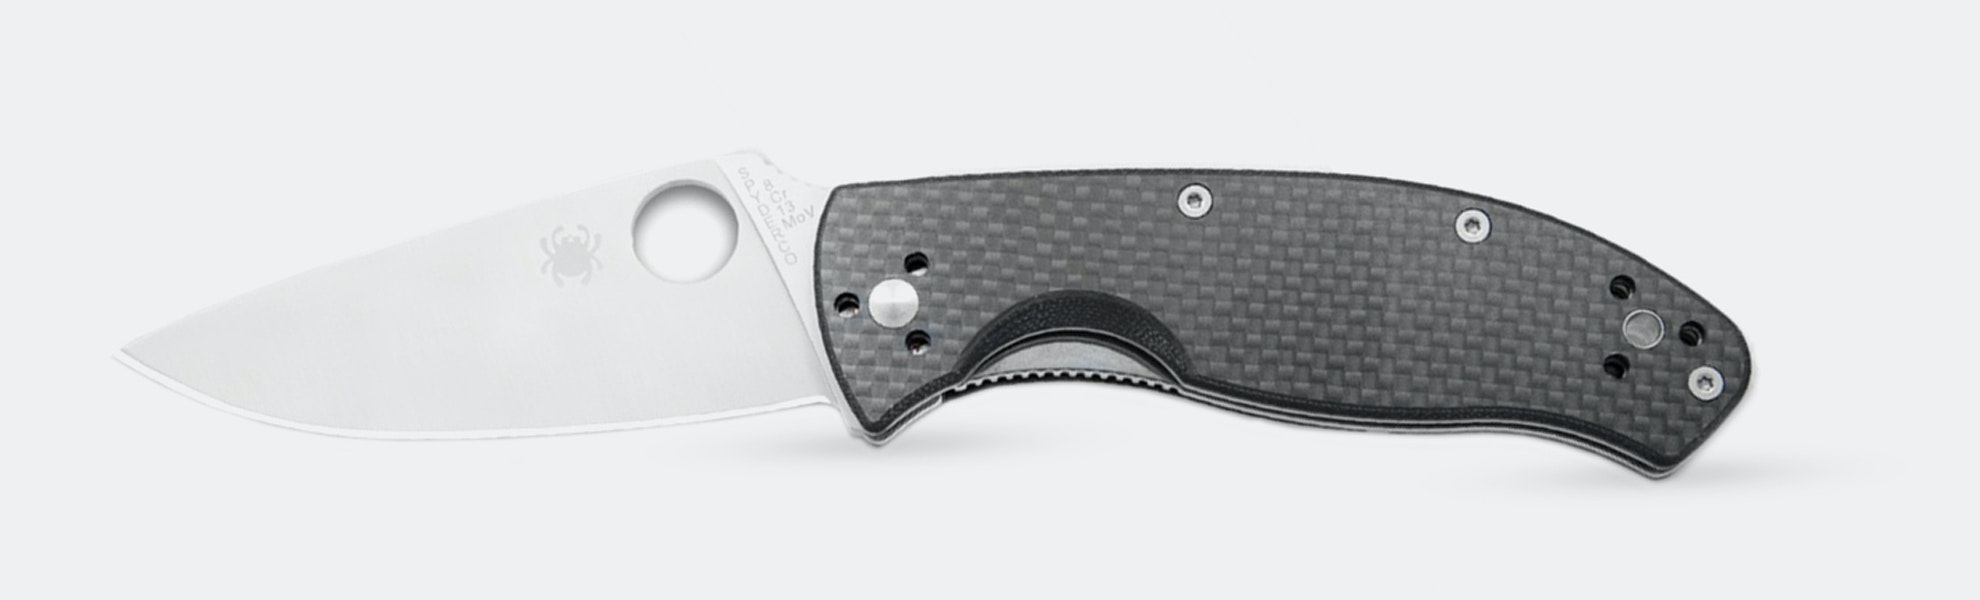 Spyderco Tenacious Carbon Fiber G-10 Folding Knife